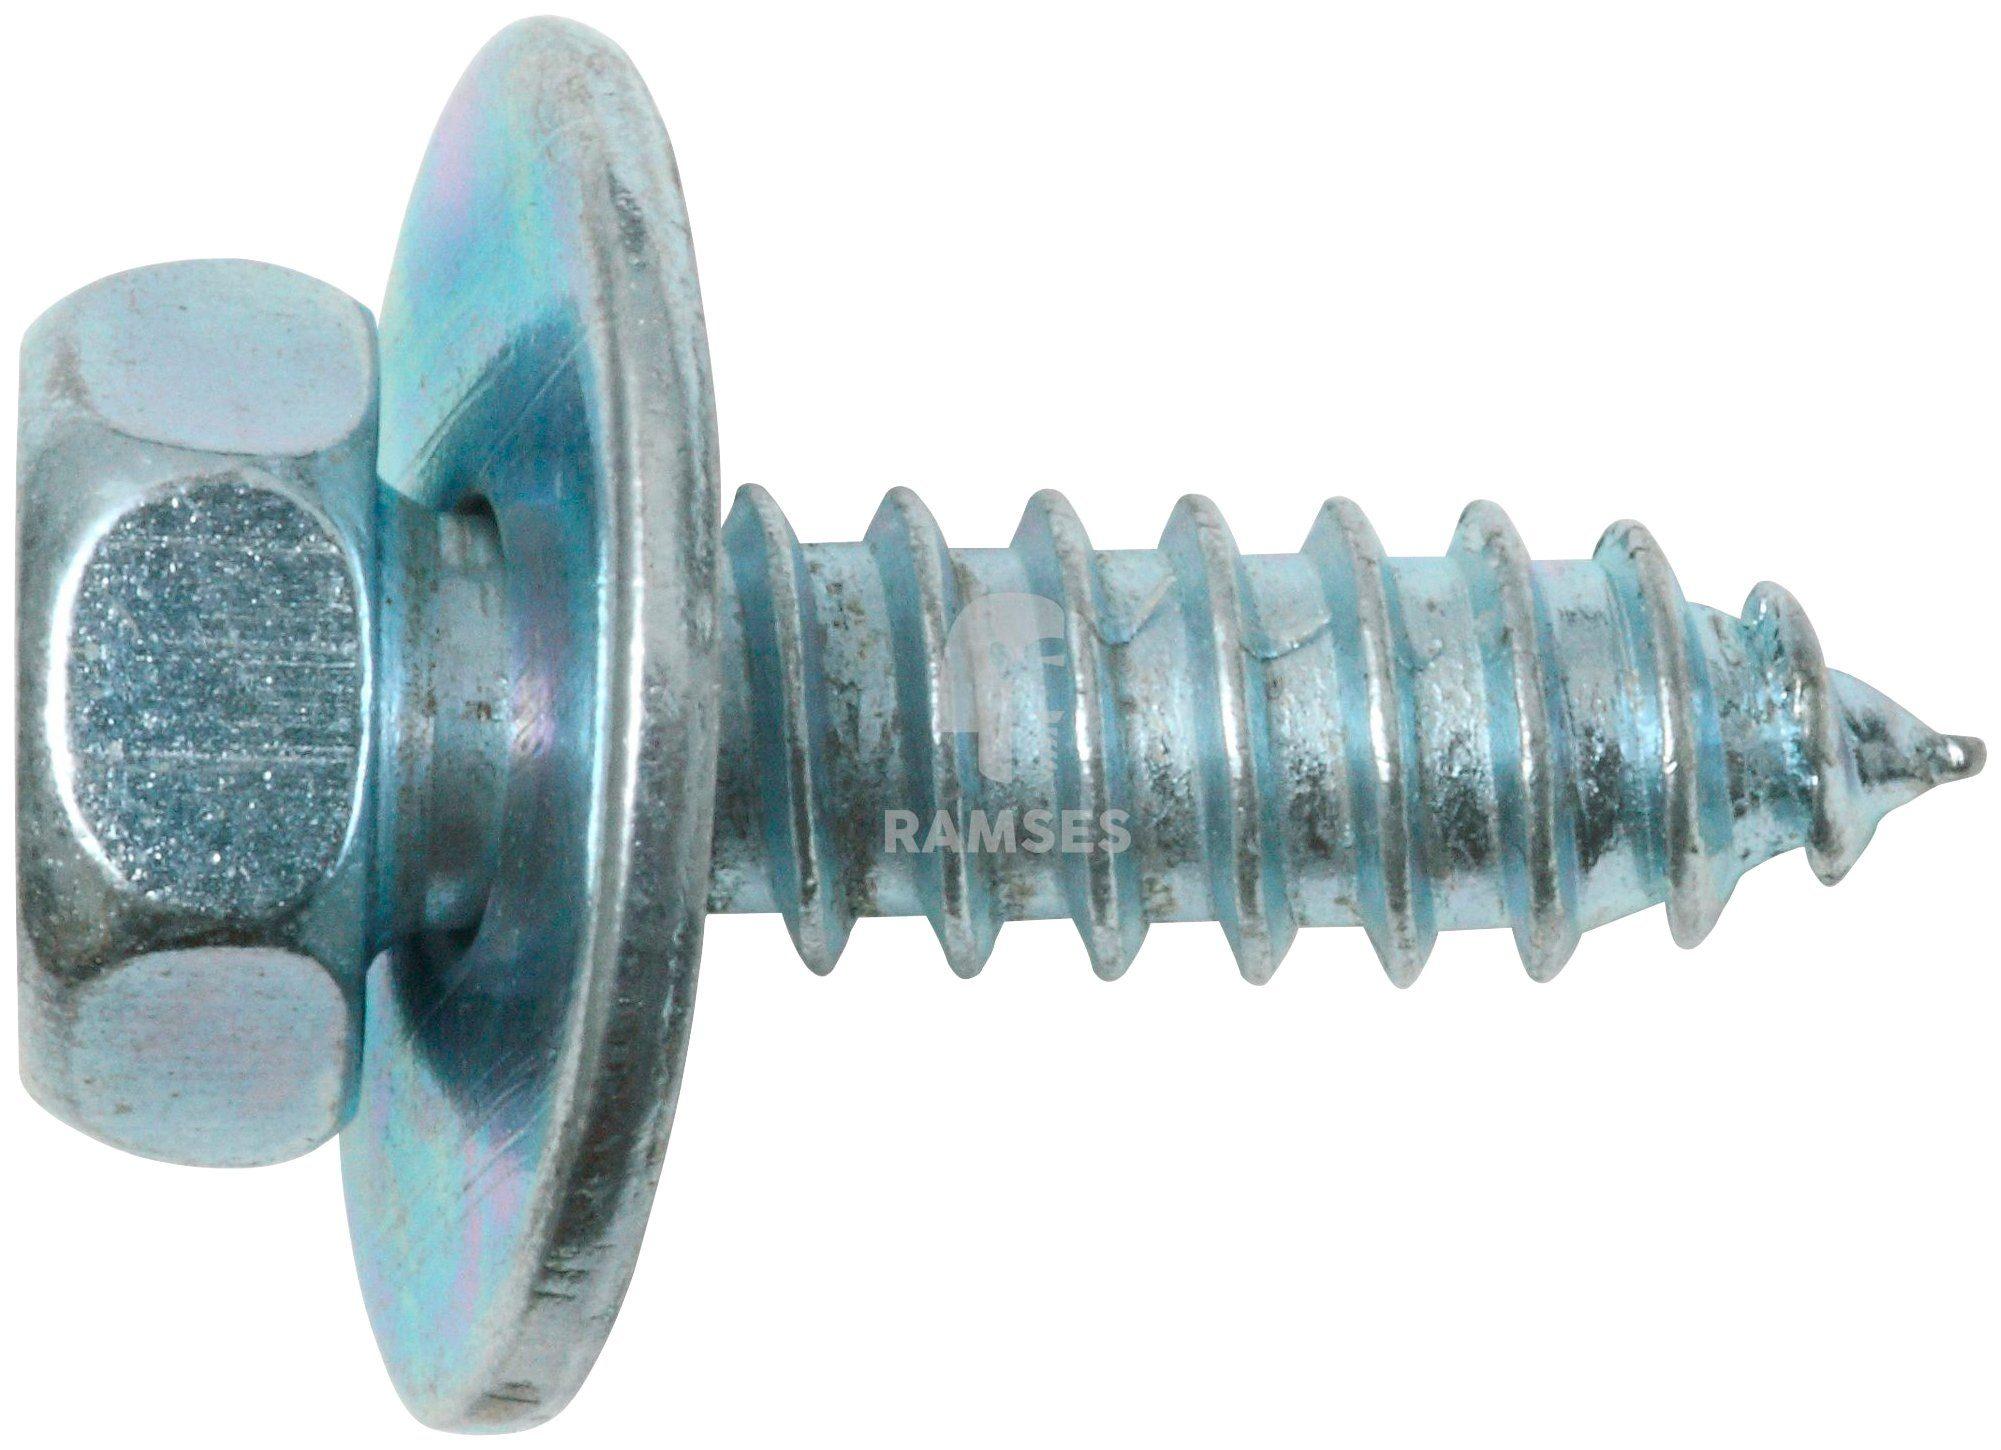 RAMSES Schrauben , Kombi Blechschraube 4,8 x 16 mm 100 Stk.